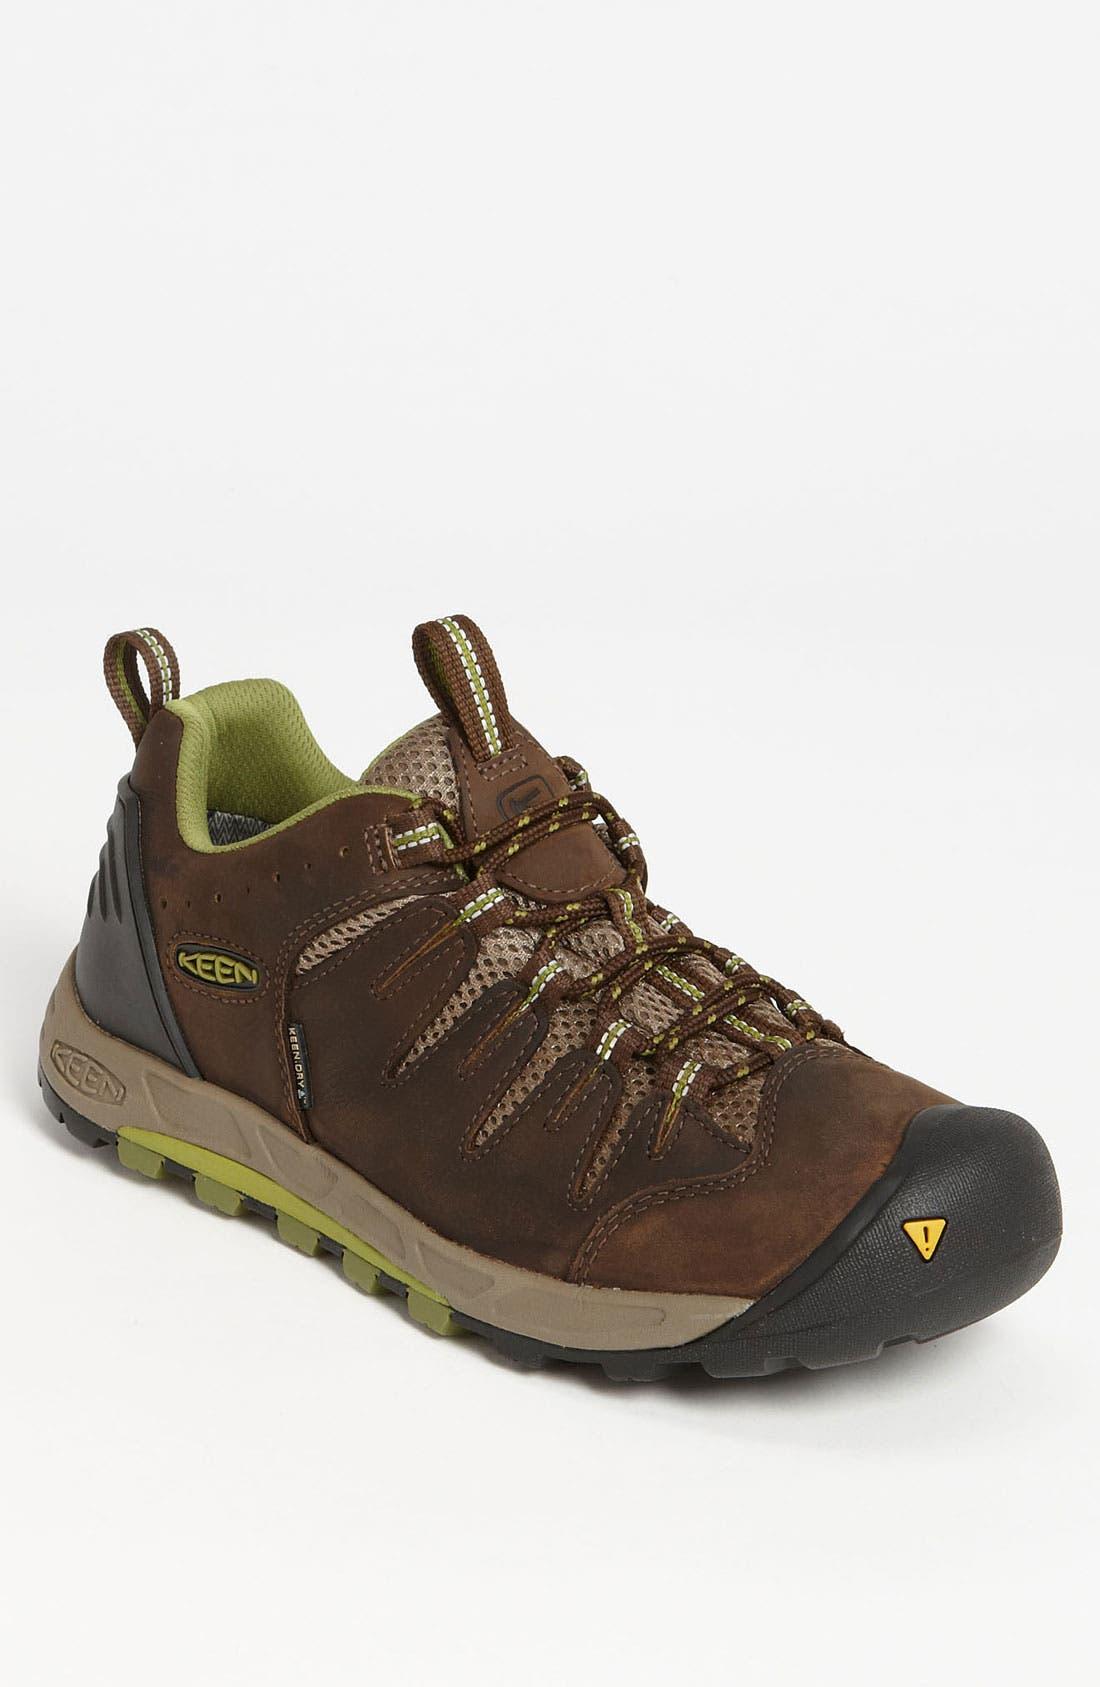 Alternate Image 1 Selected - Keen 'Bryce' Hiking Shoe (Men)